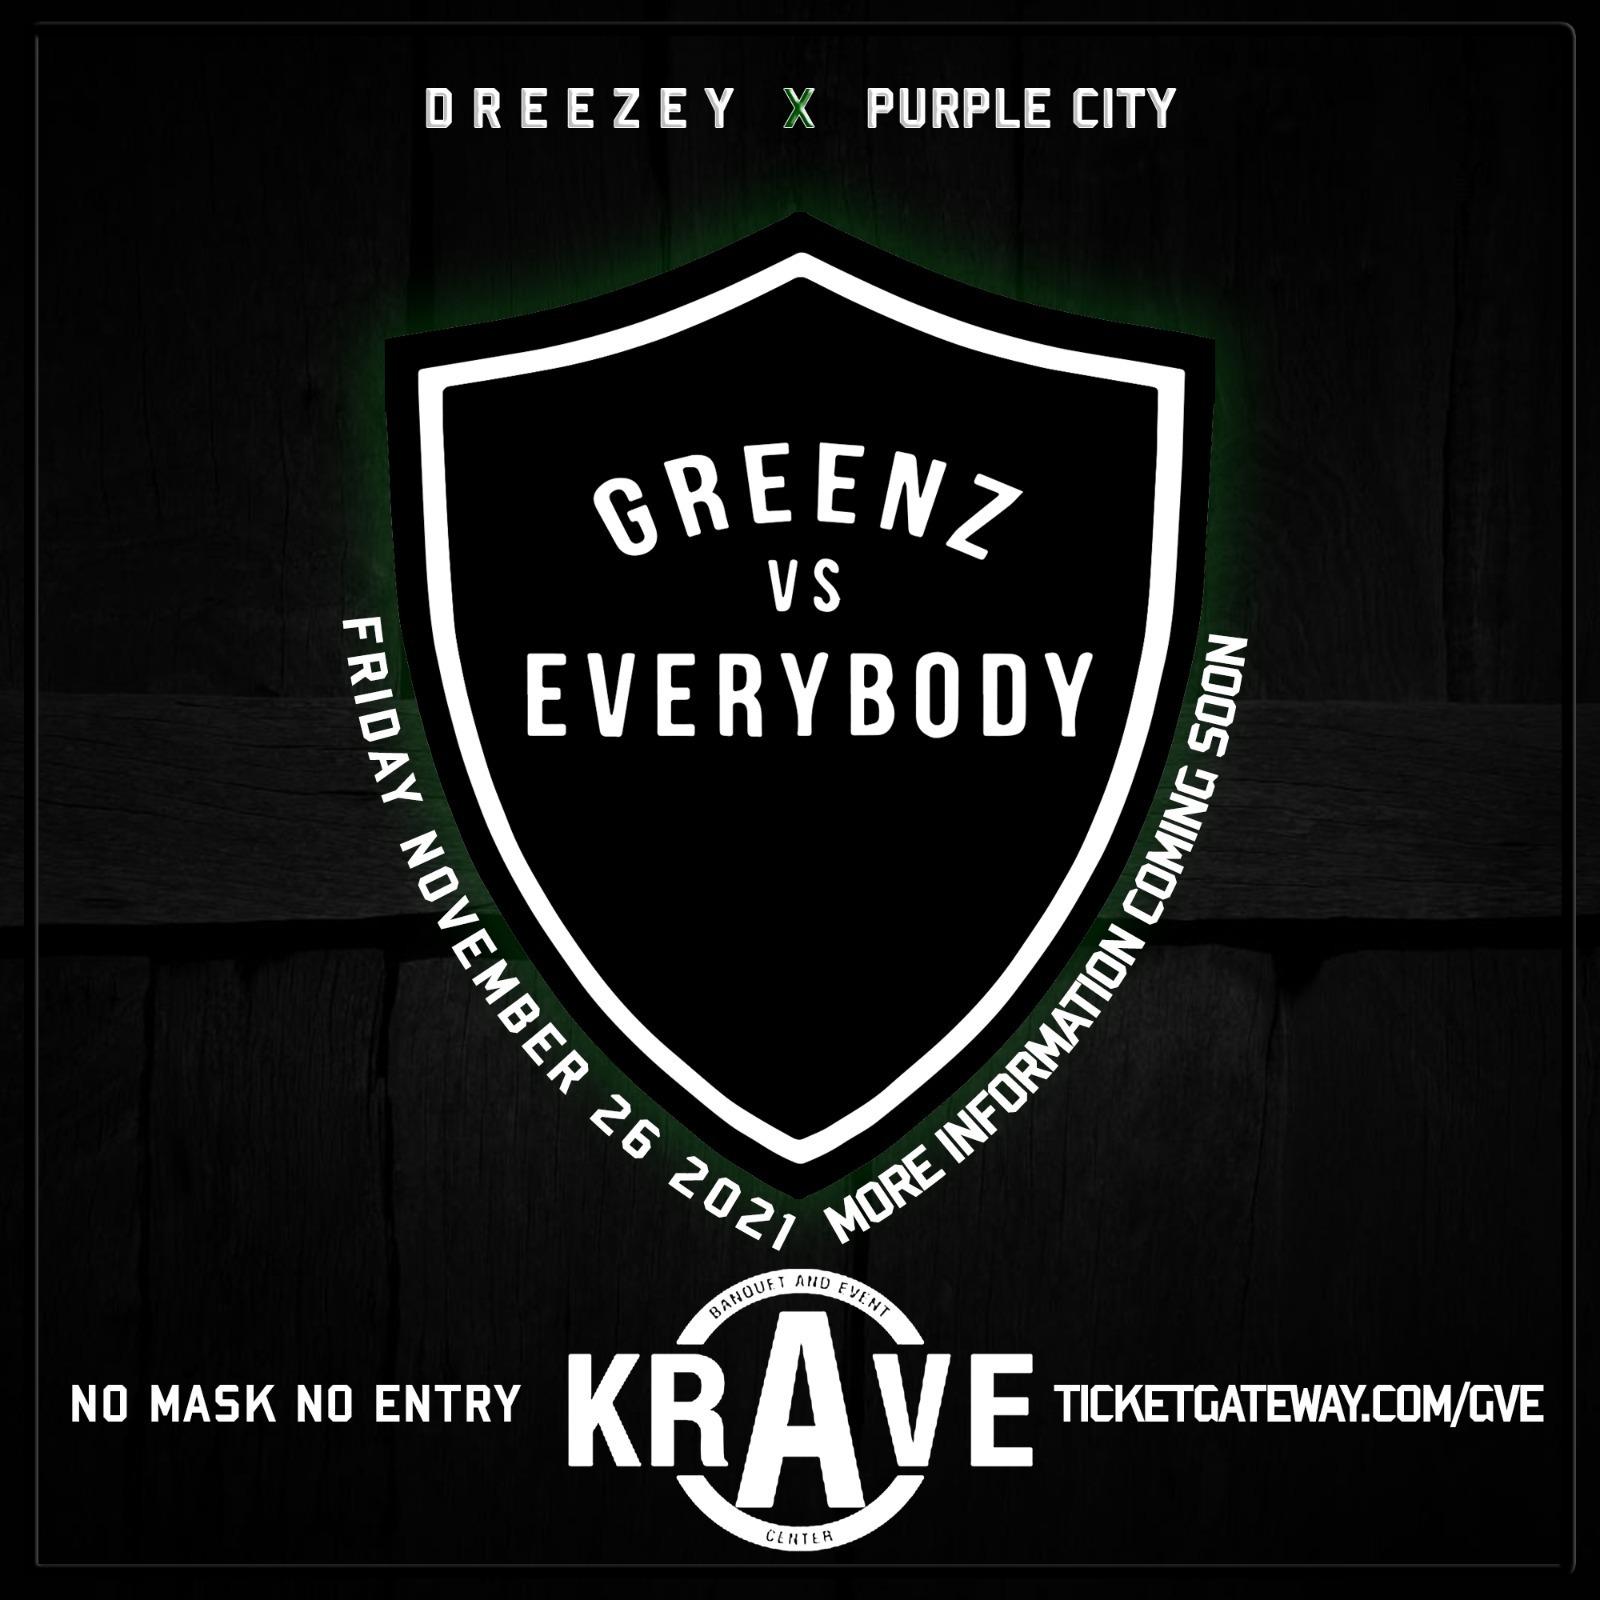 Greenz Vs Everybody - Presented by Dreezey & Purple City